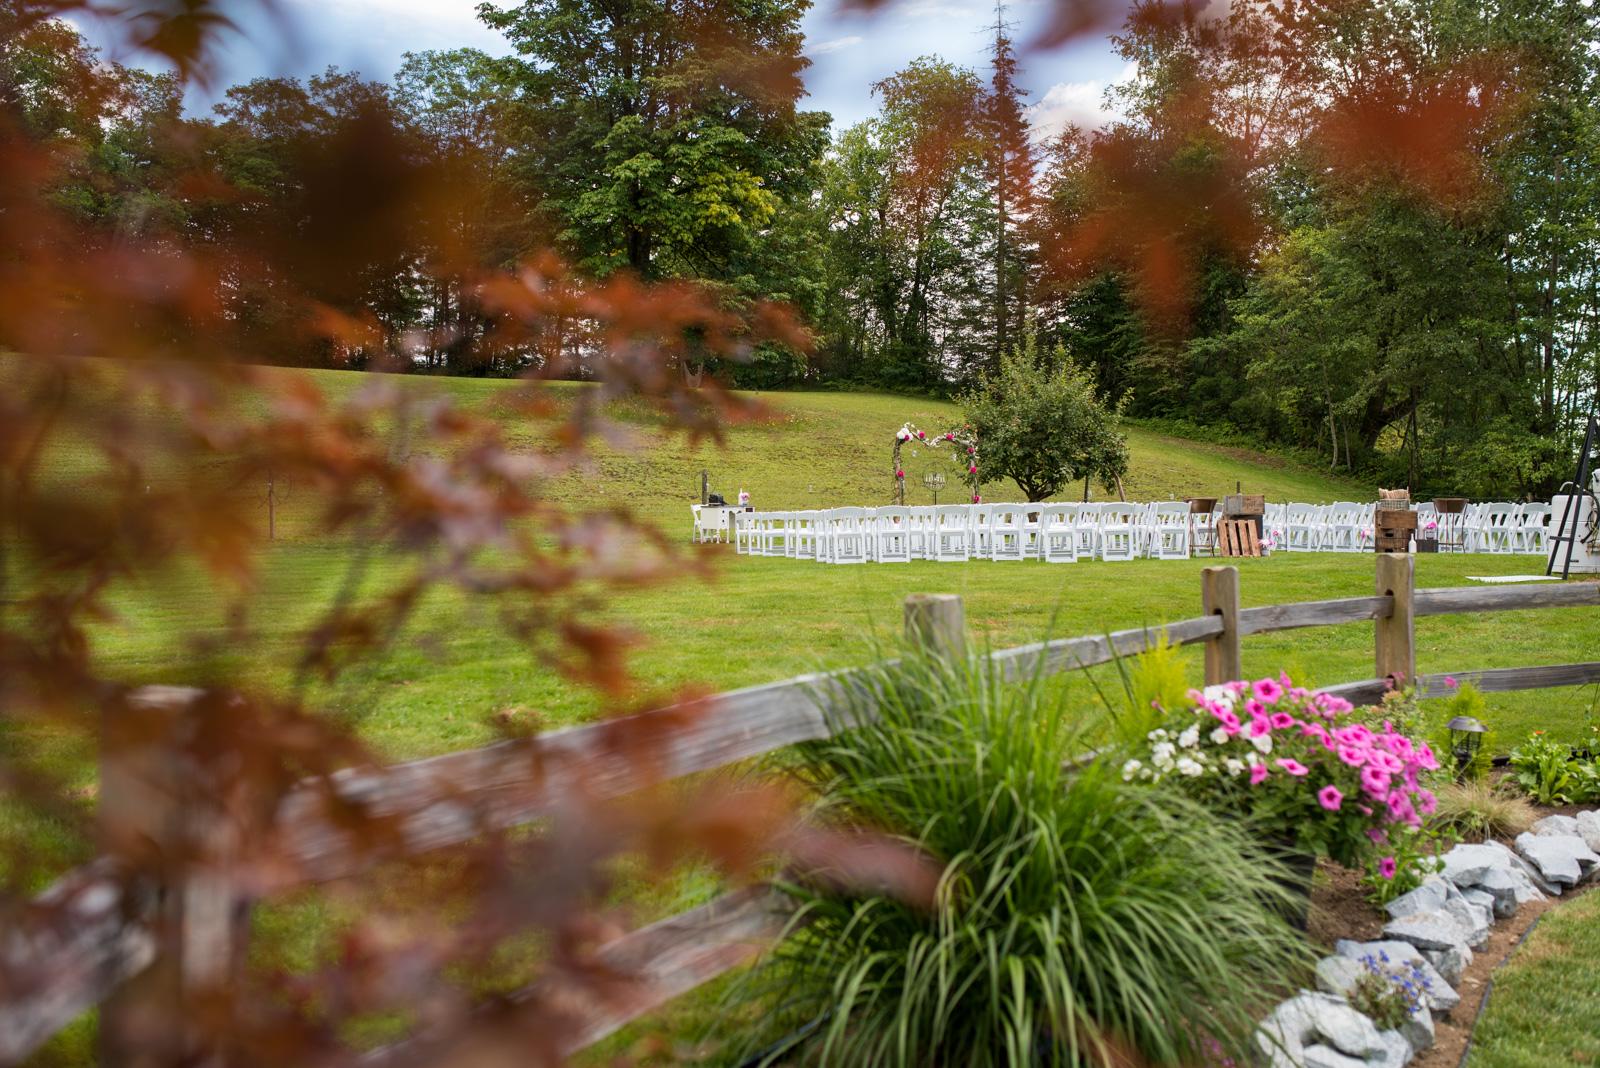 vancouver-island-wedding-photographers-backyard-wedding-mission-bc-16.jpg